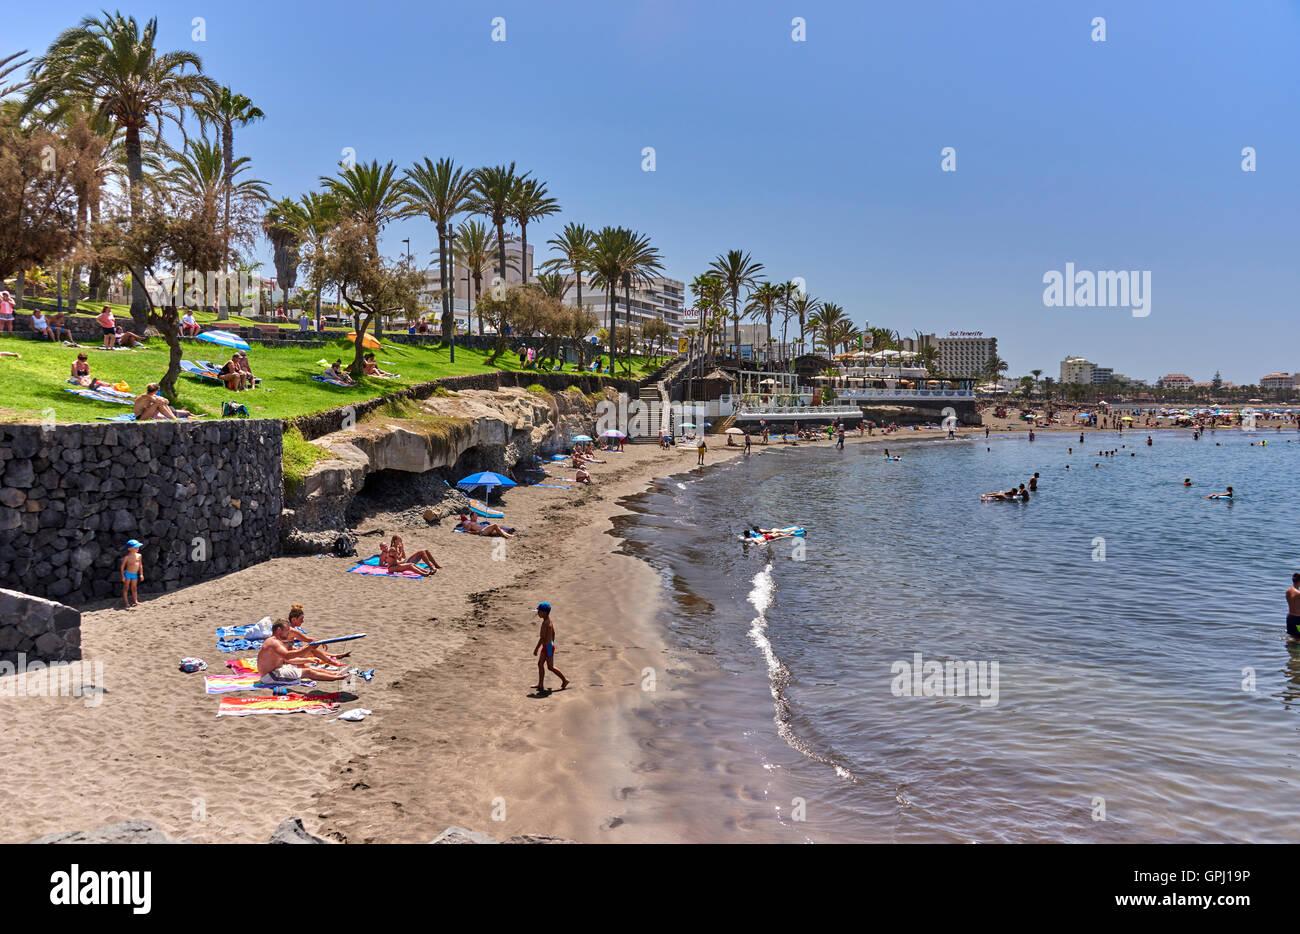 Hotel Jardin Tropical Costa Adeje Tenerife Stock Photo 117180834